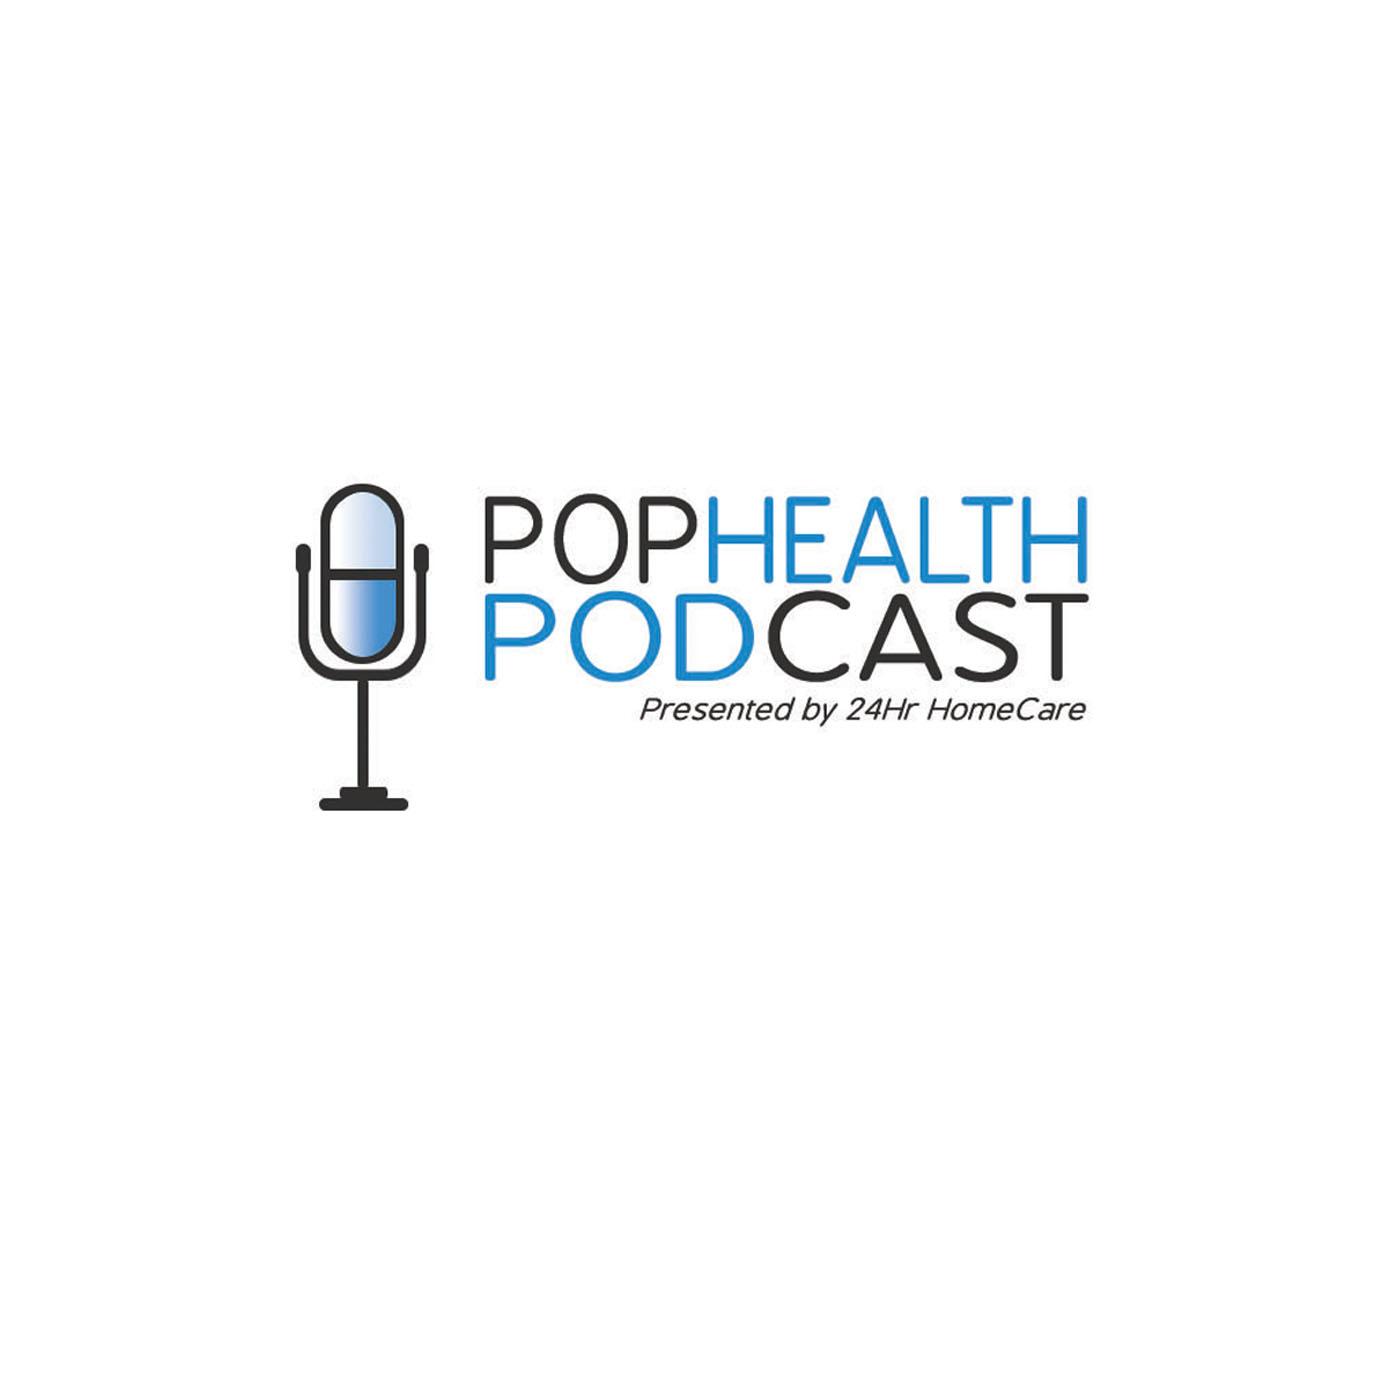 PopHealth Podcast show art